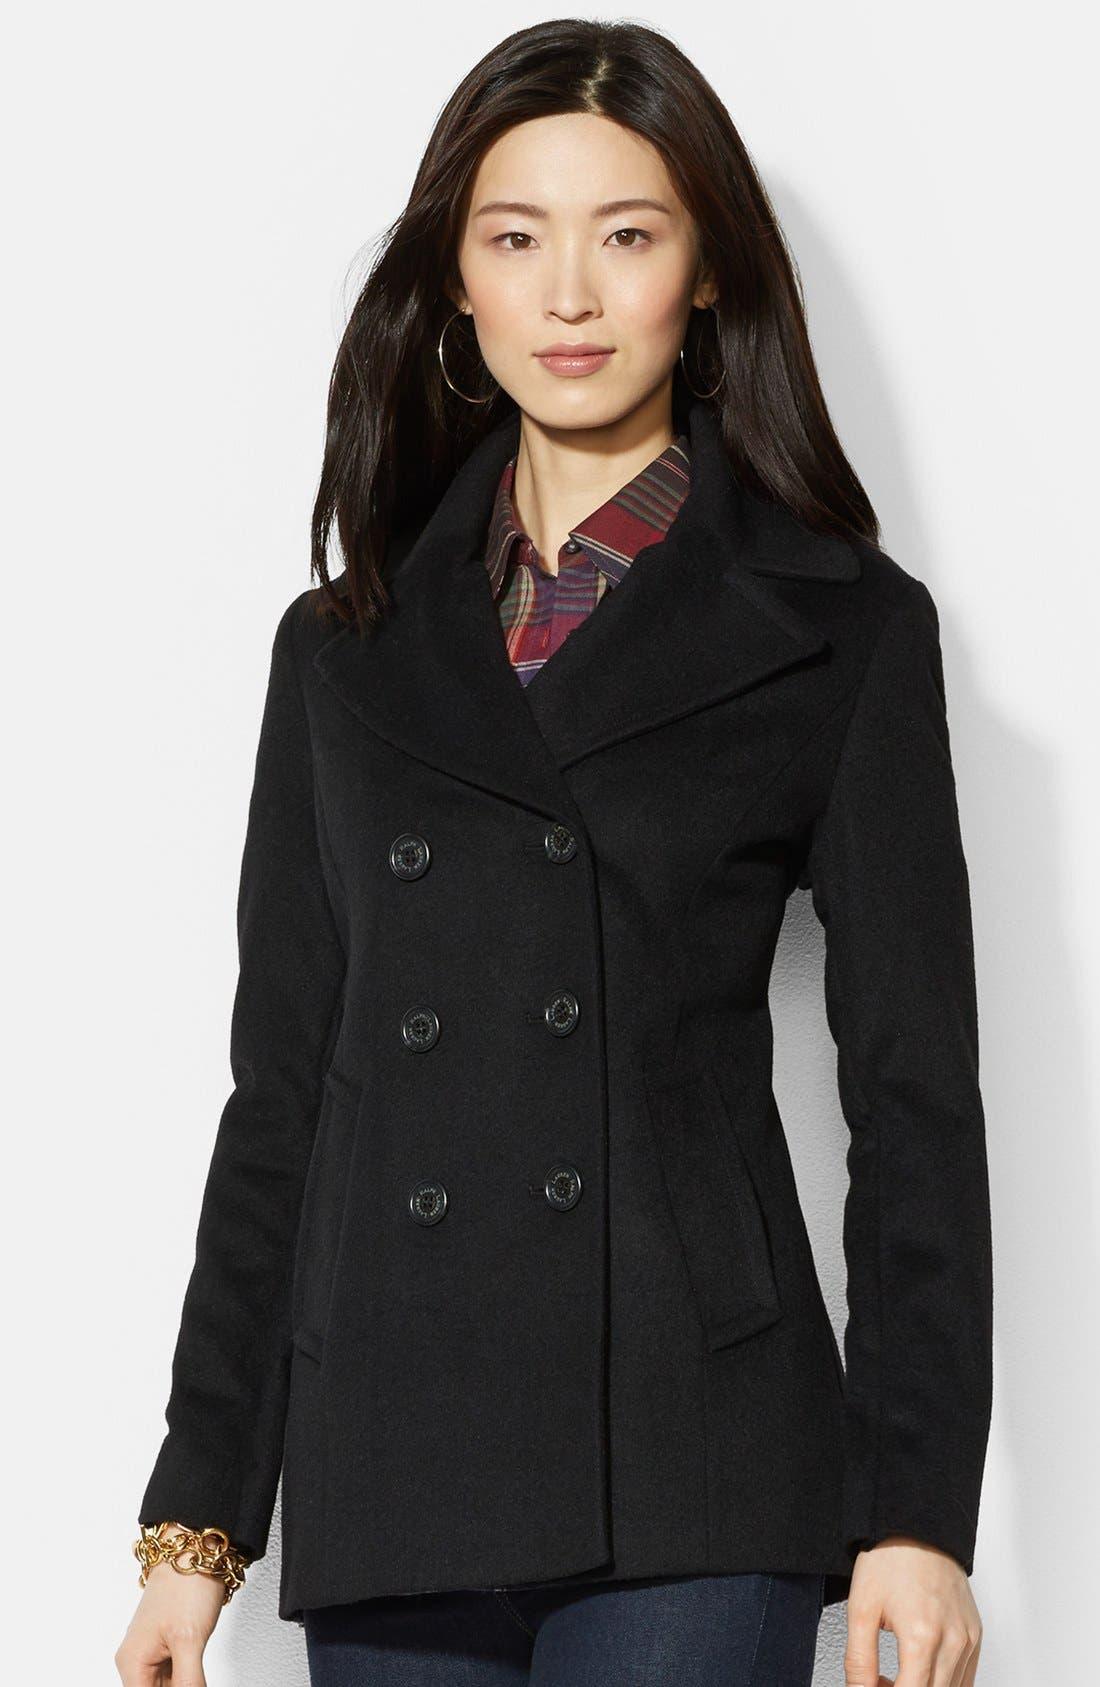 Alternate Image 1 Selected - Lauren Ralph Lauren Double Breasted Wool Blend Peacoat (Online Only)